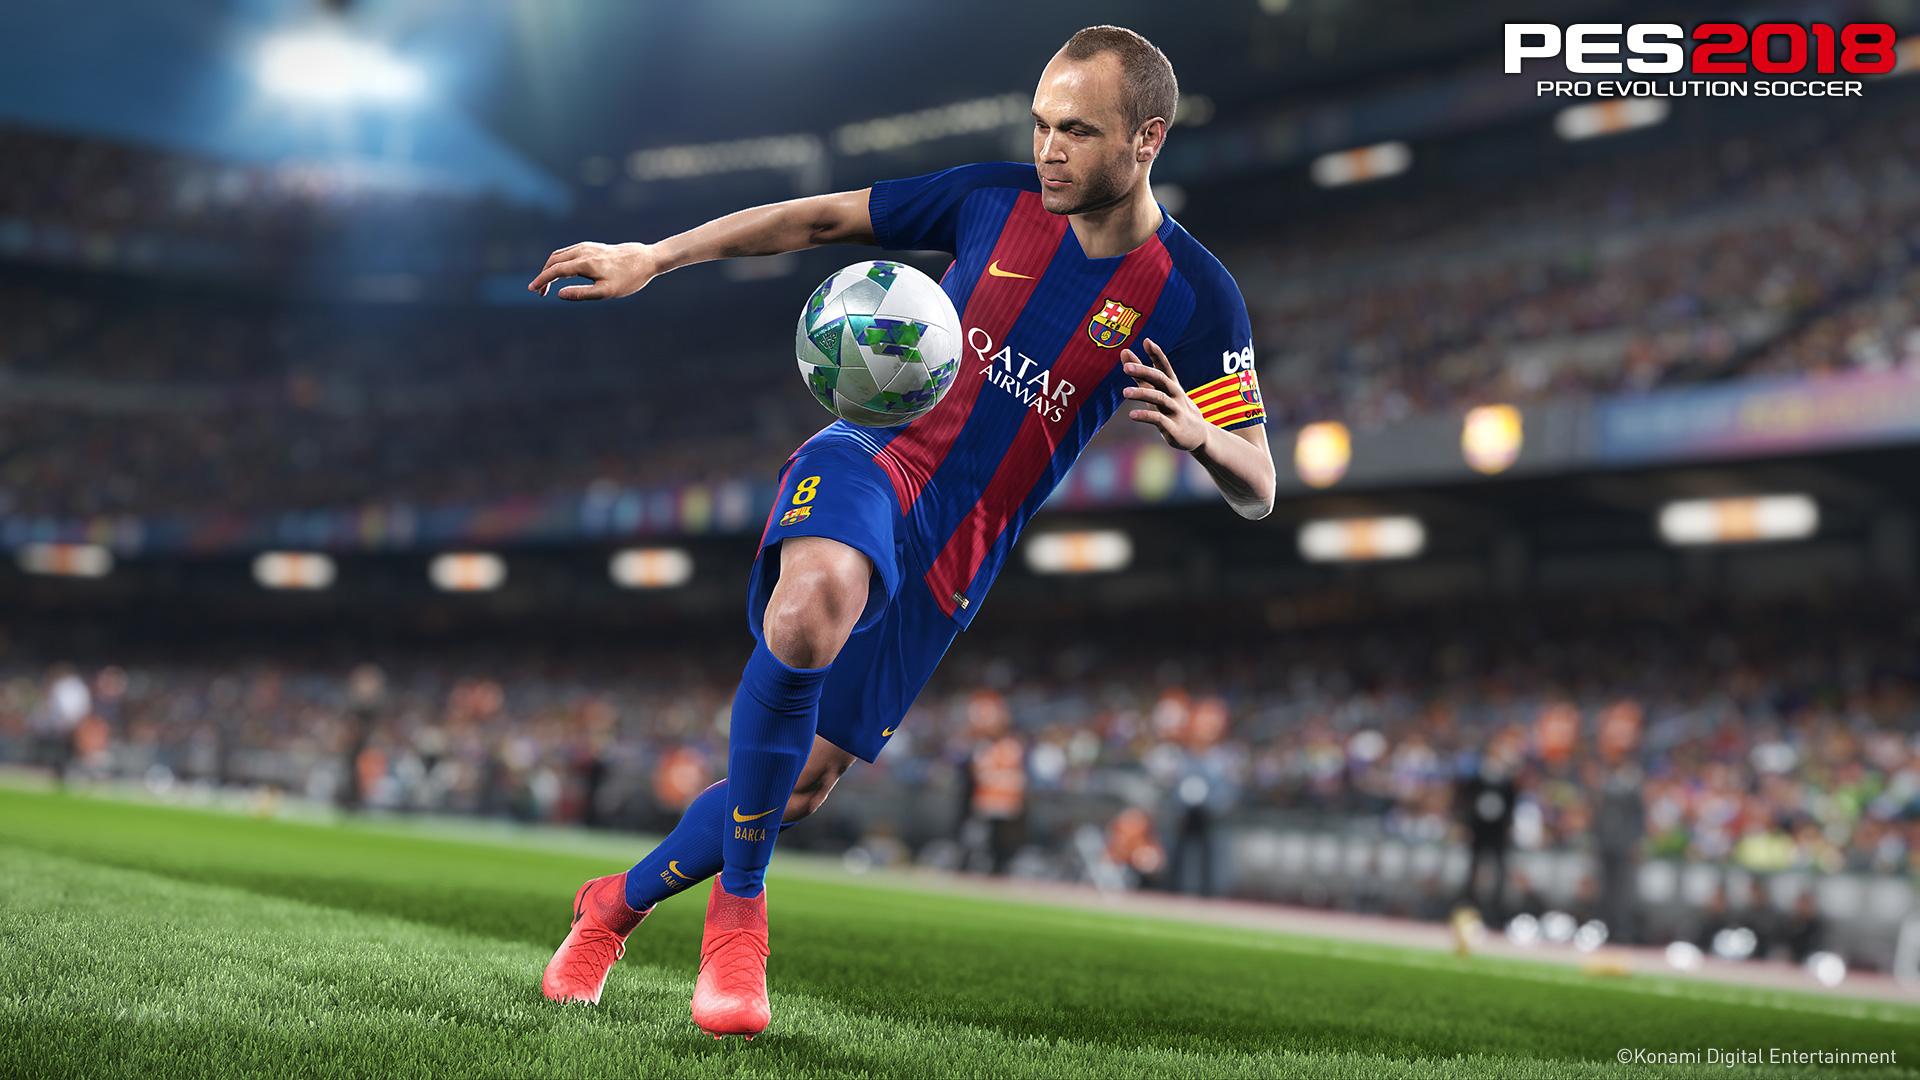 PES 2018: data d'uscita, gameplay e trailer